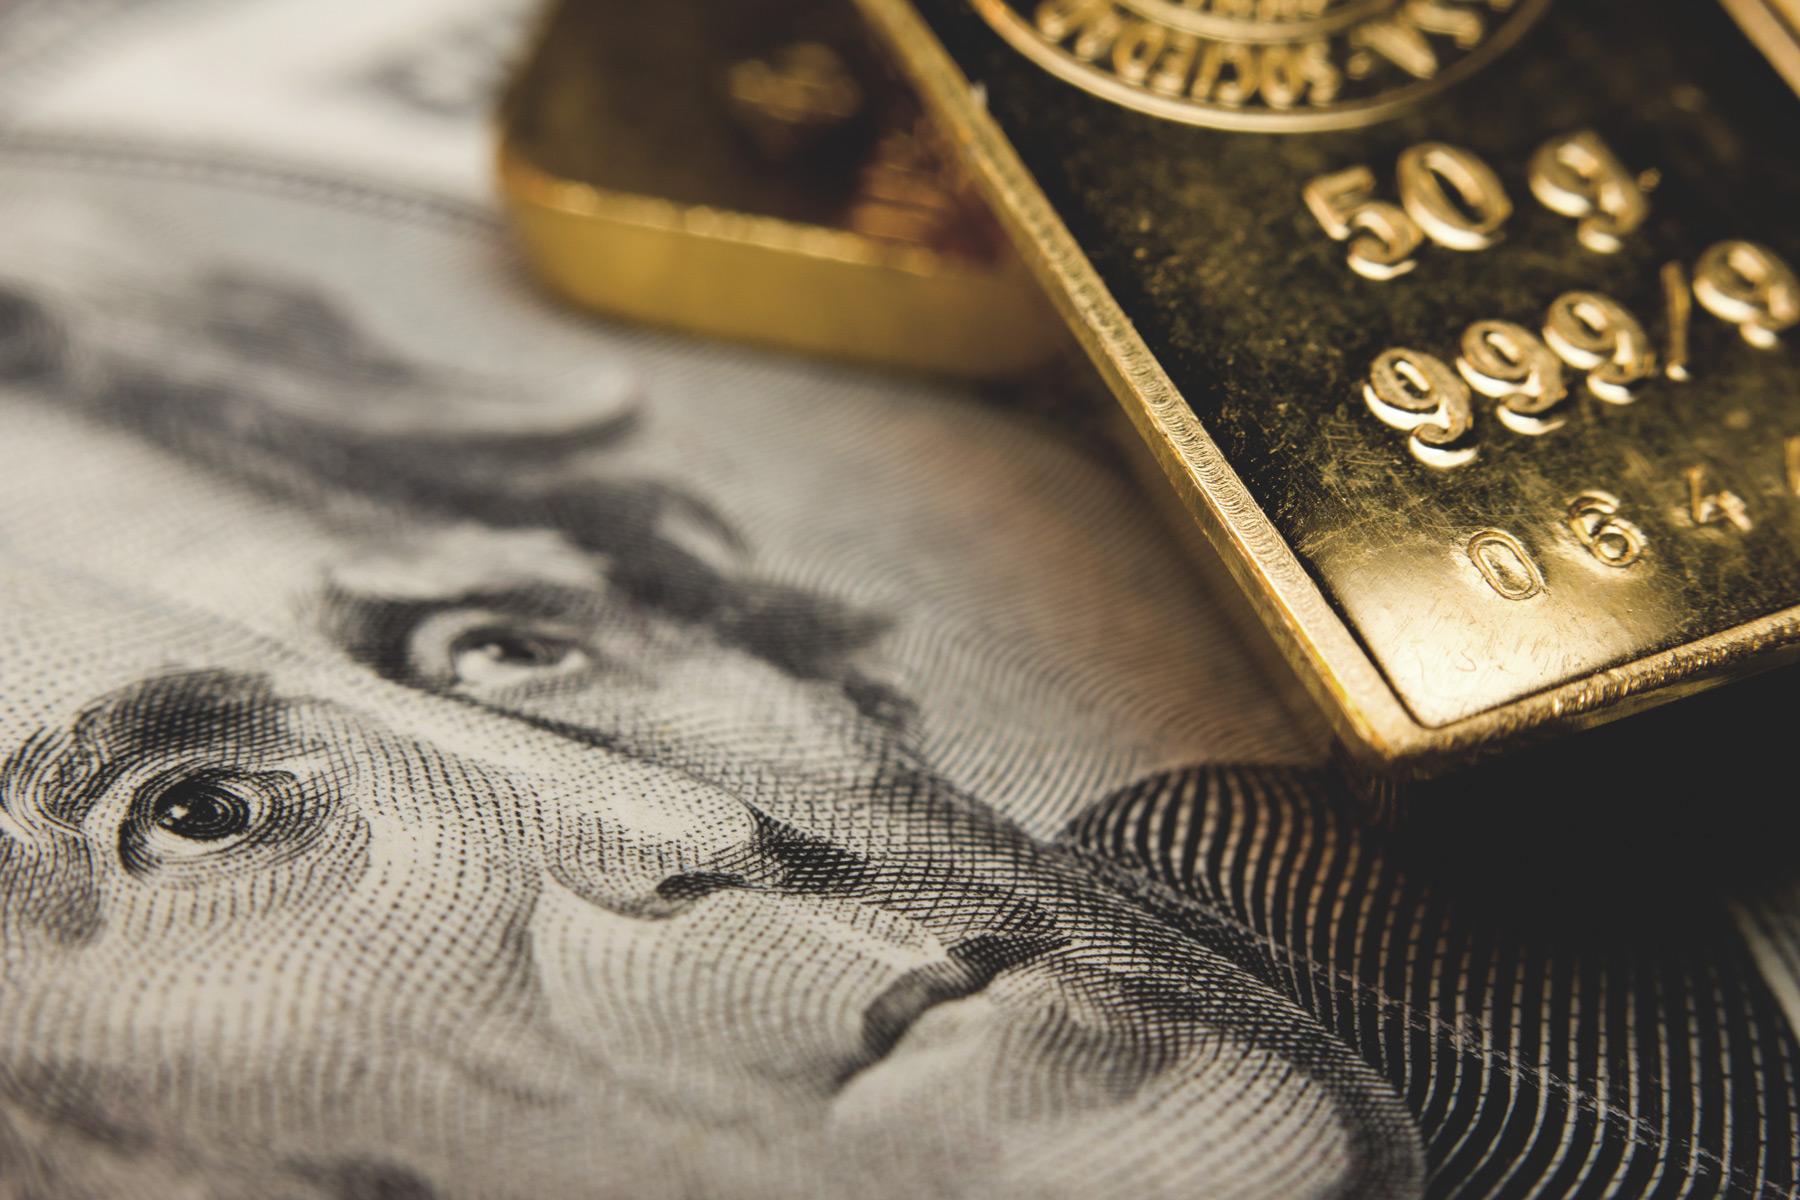 Američki dolari i zlatne poluge (Foto: pantalla Macro/besthqwallpapers.com)